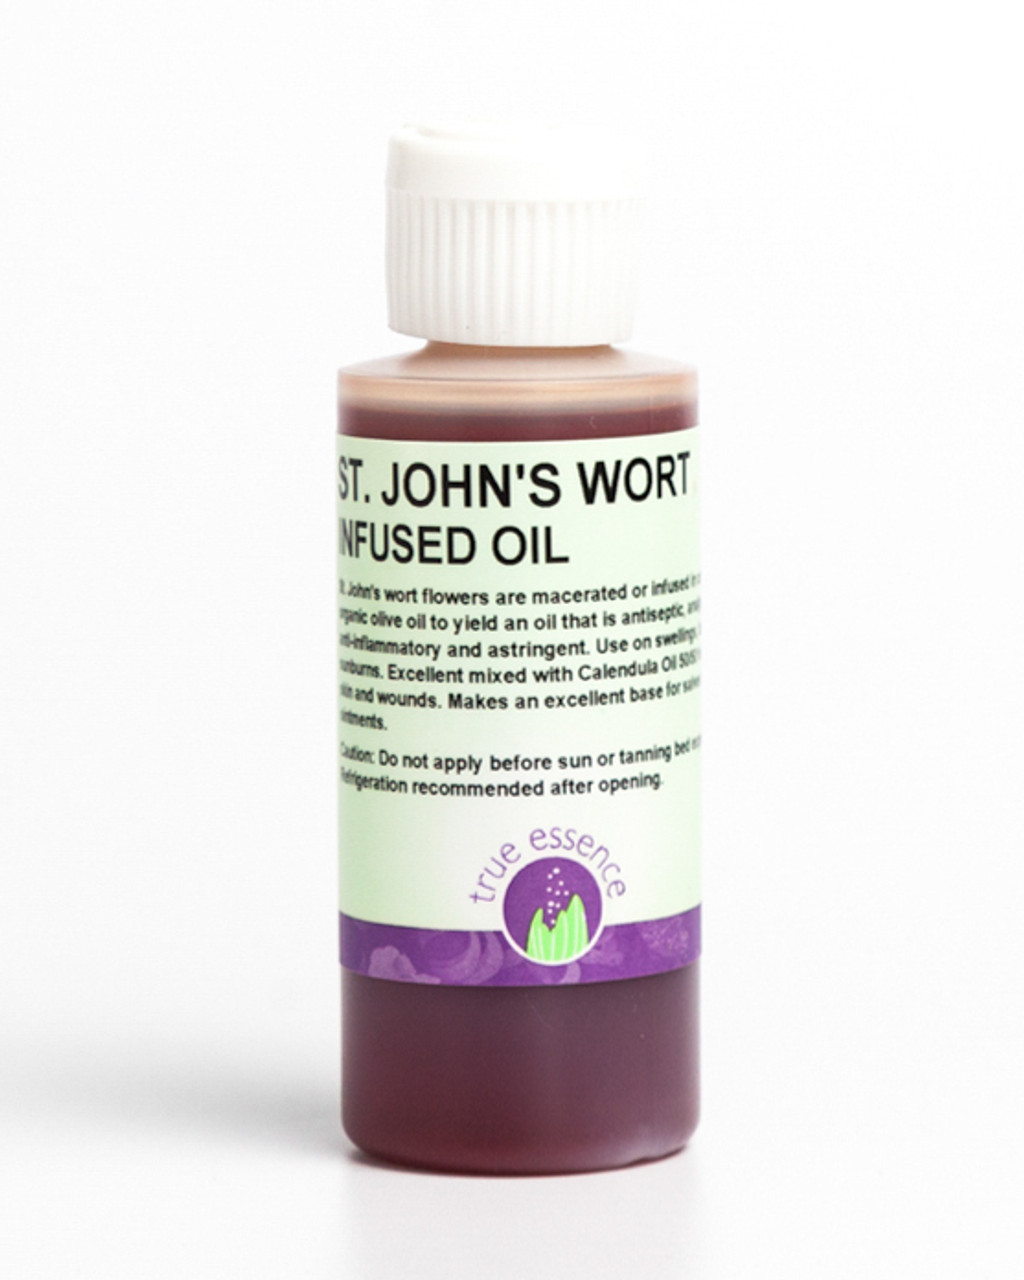 ST JOHN'S WORT OIL Infused